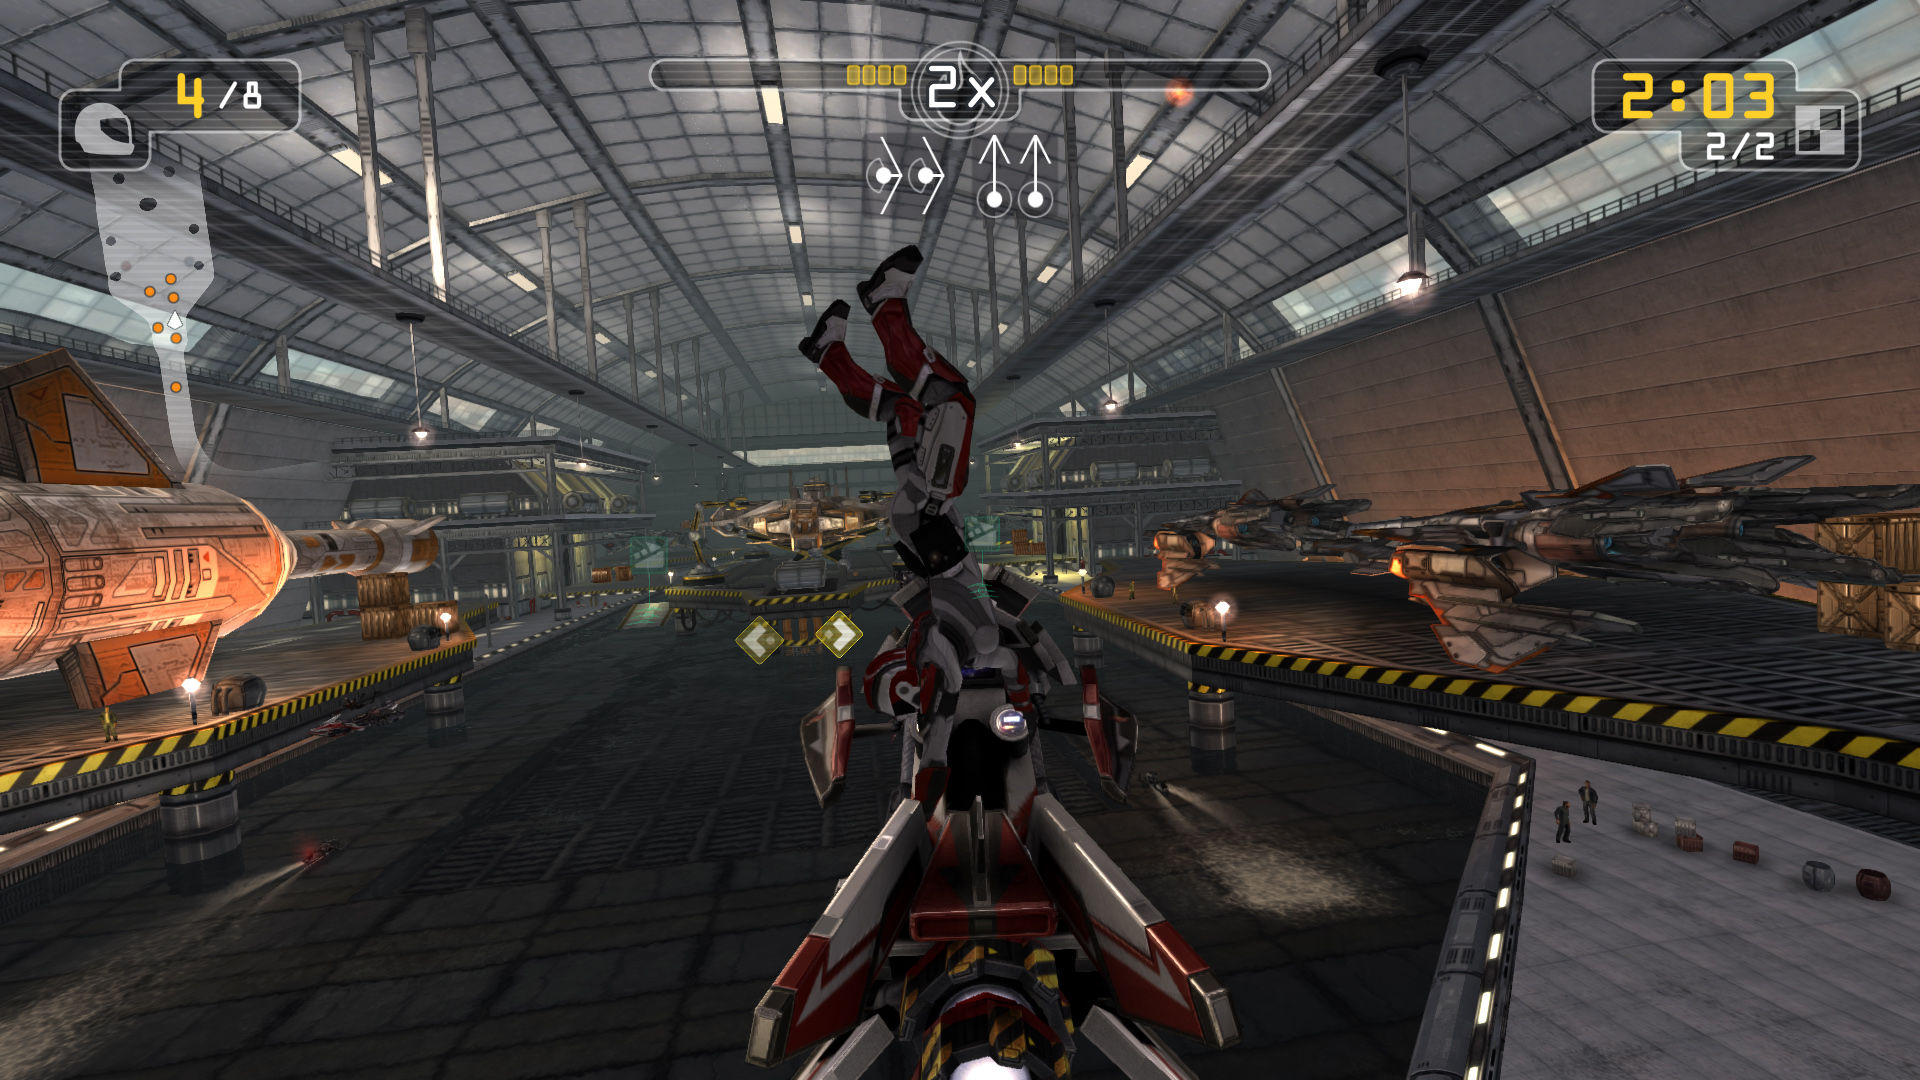 RiptideGP_Renegade_Spaceport02_160312.jpg